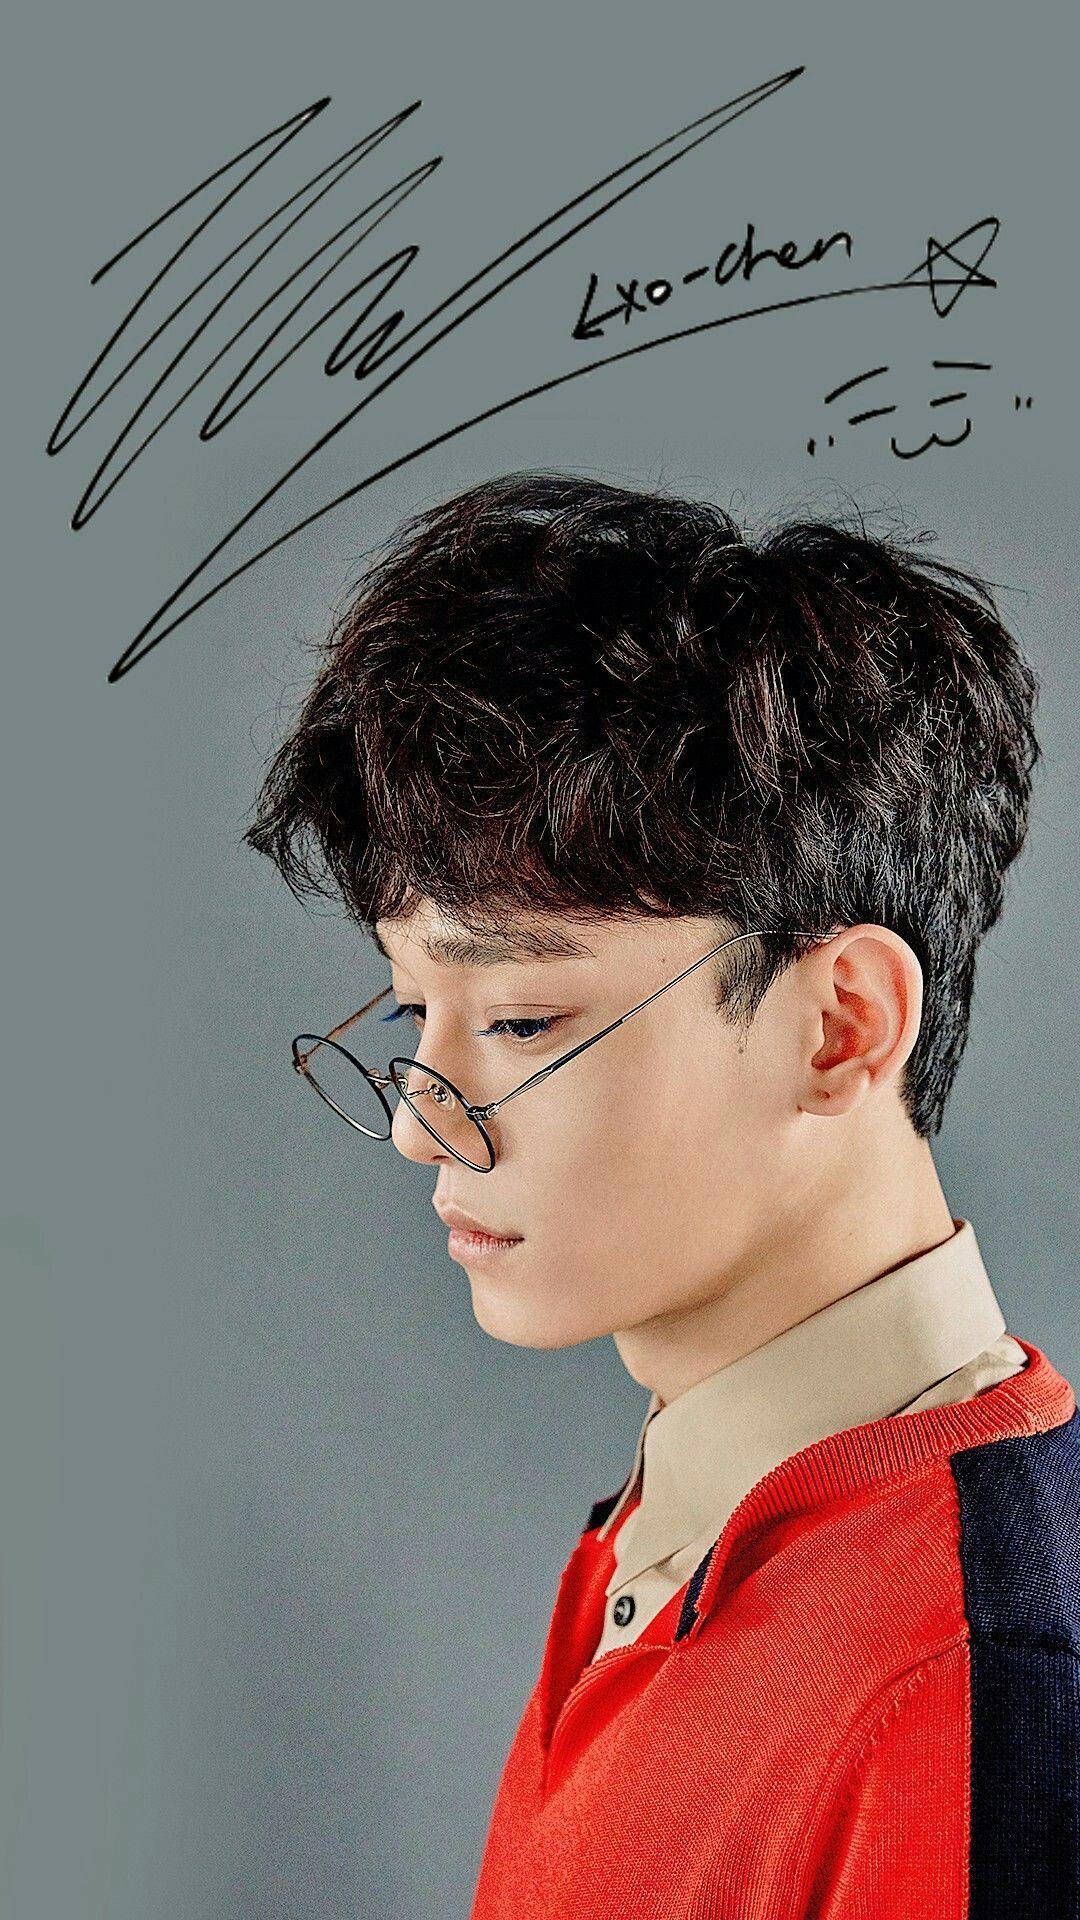 Exo Chen Hd Wallpapers Wallpaper Cave